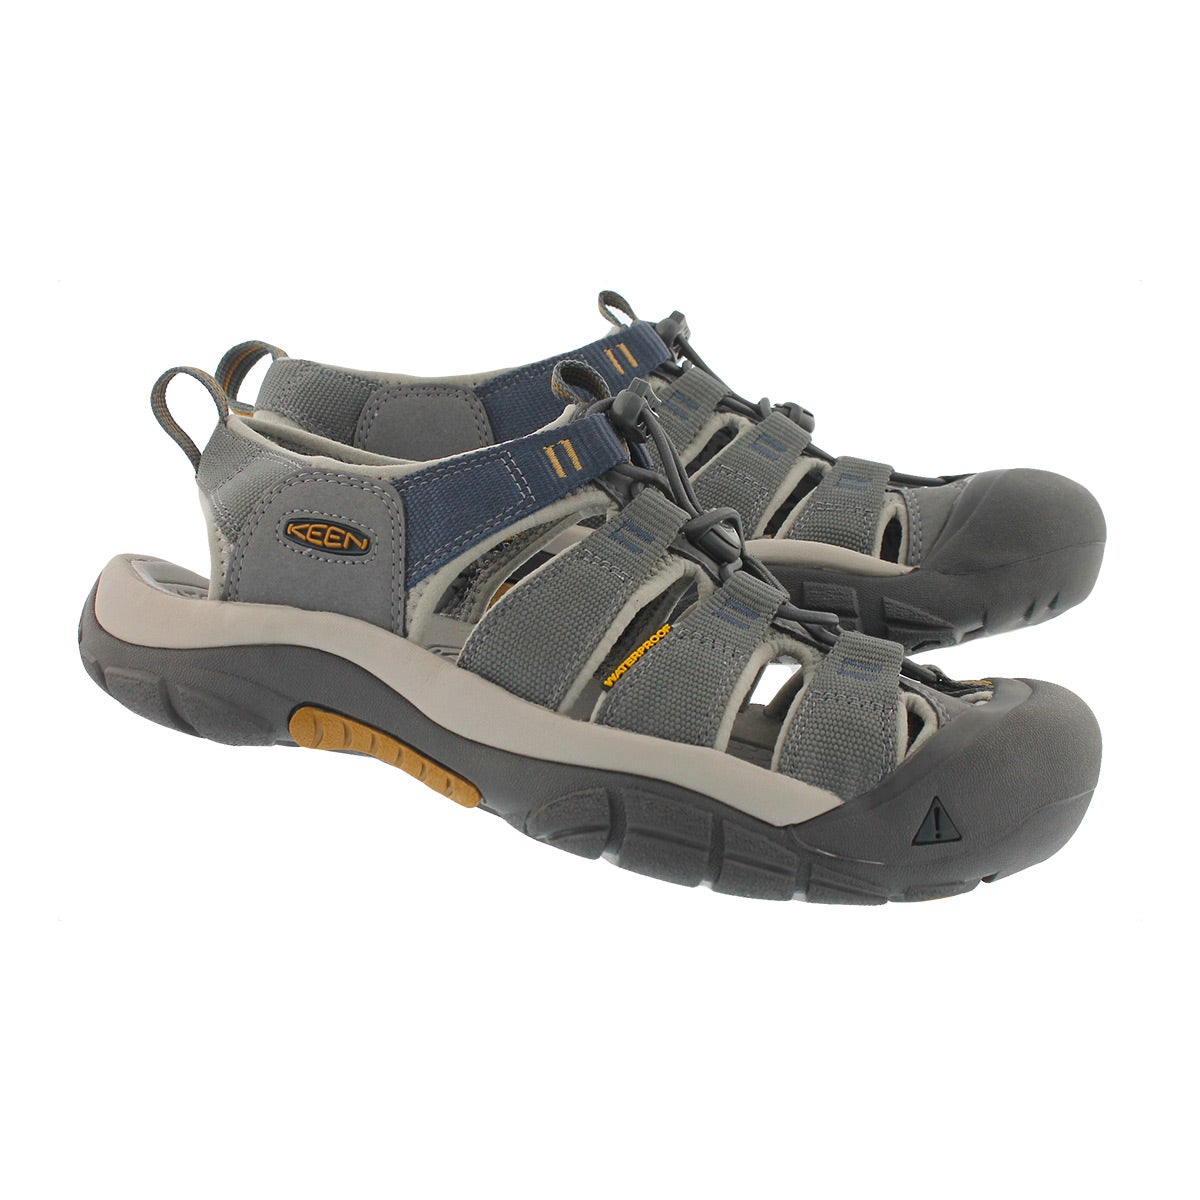 Mens Newport Hydro steel gy sport sandal